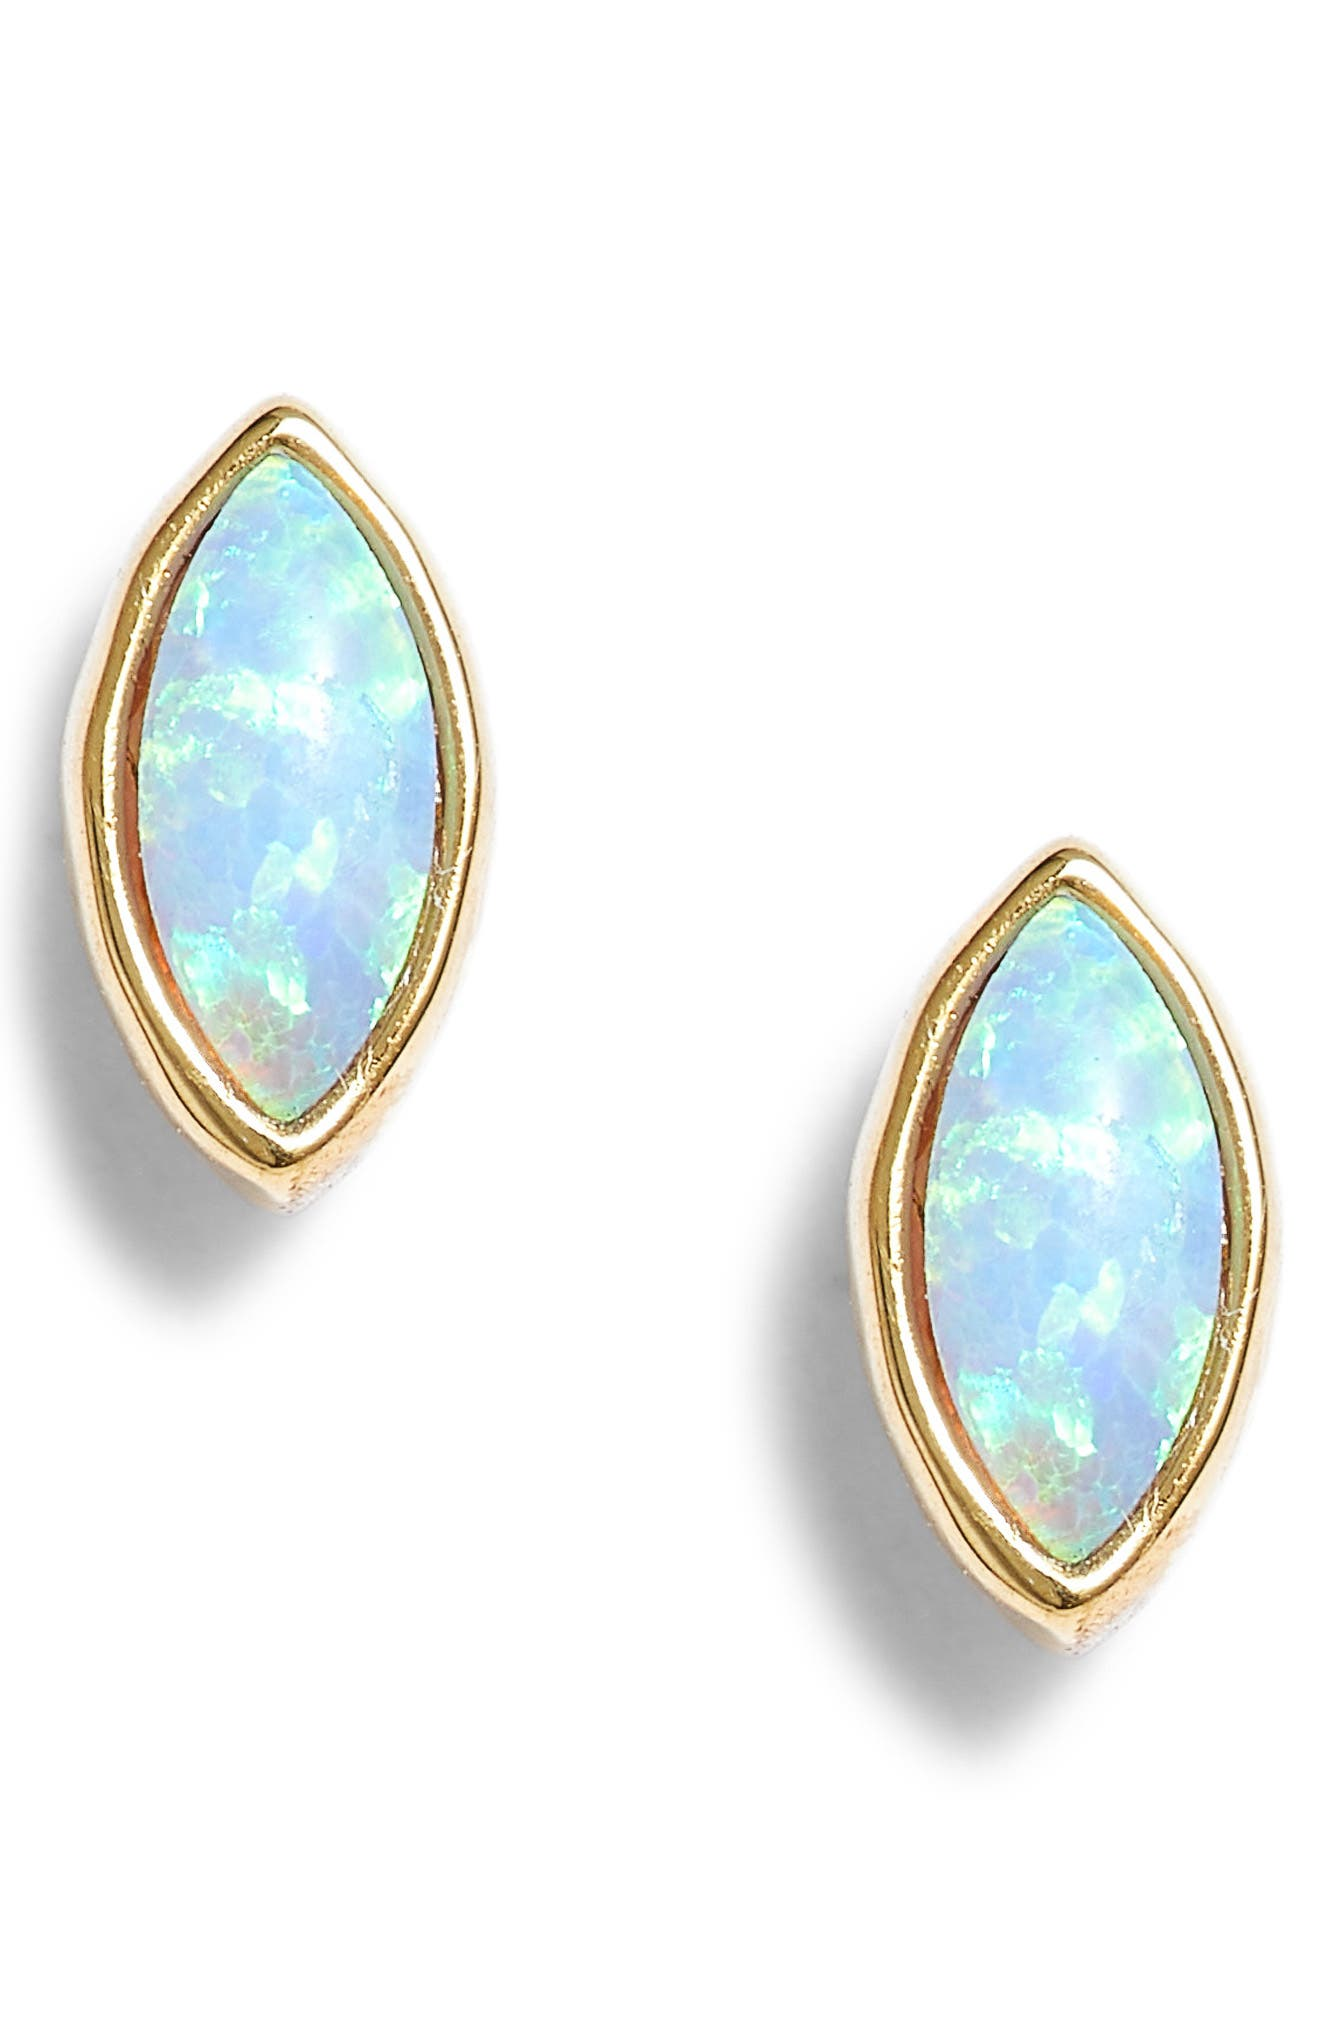 Rumi Opalite Stud Earrings,                             Main thumbnail 2, color,